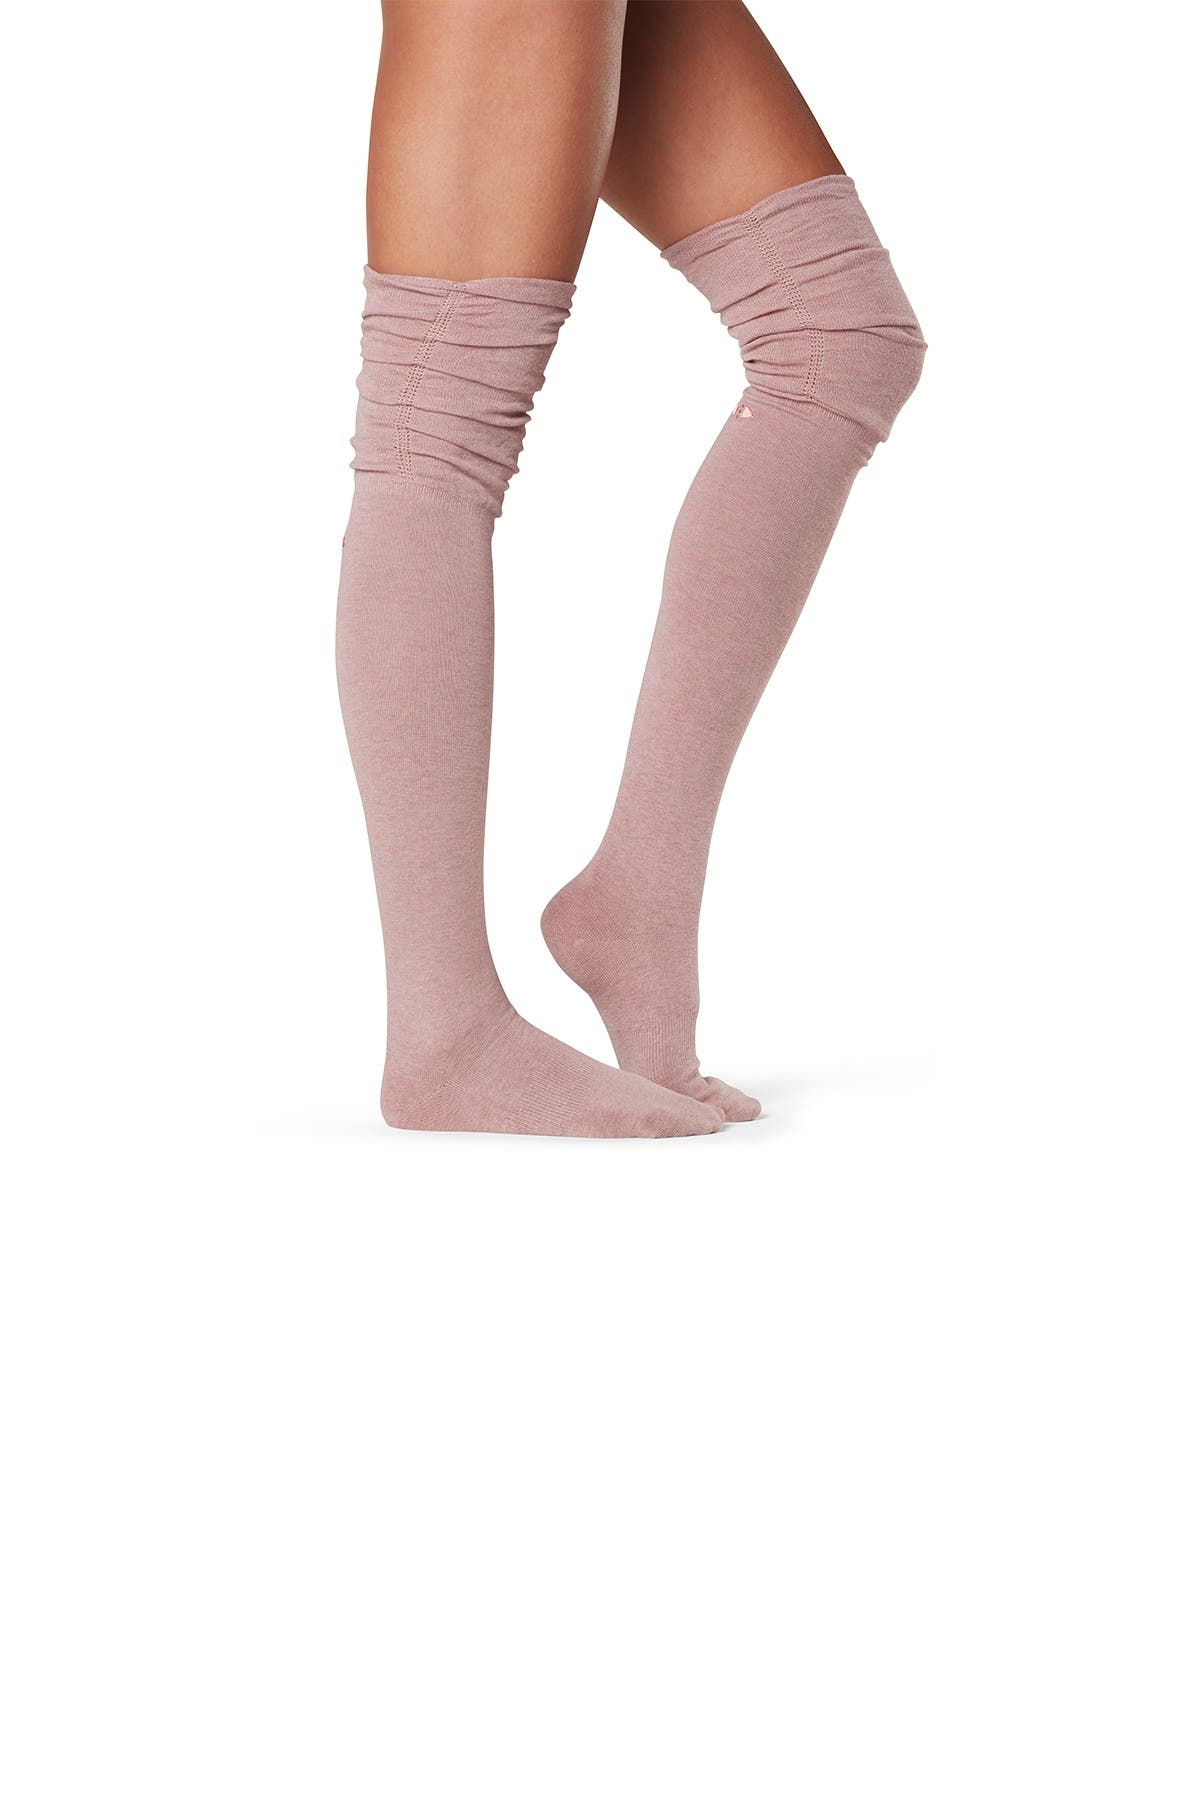 Image of Tavi Noir Charlie Casual Over-the-Knee Socks